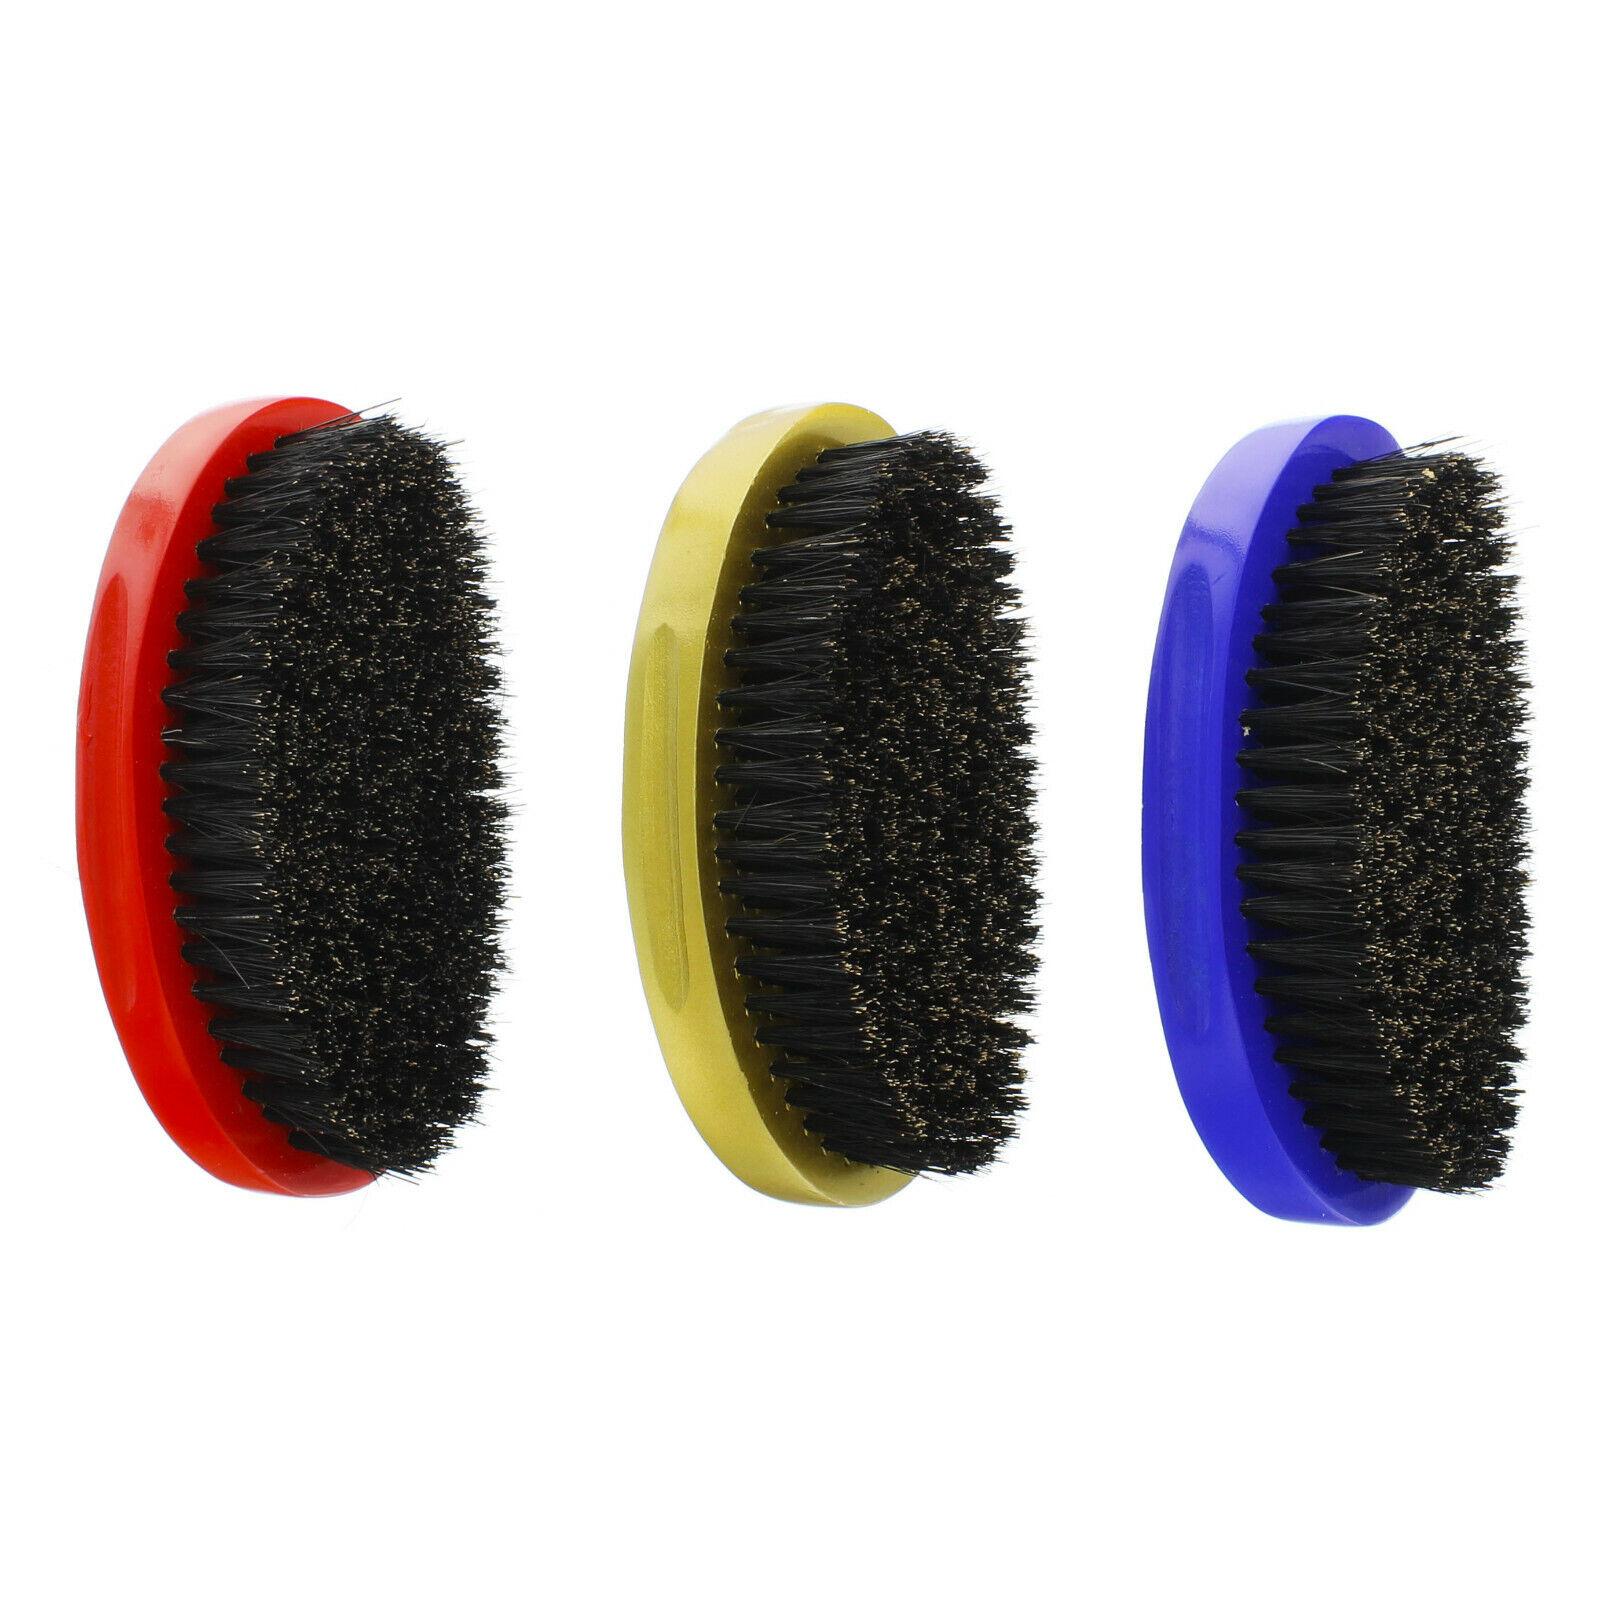 SOFT HARD Premium Boar Bristle Curved Wave Palm Hair Brush W